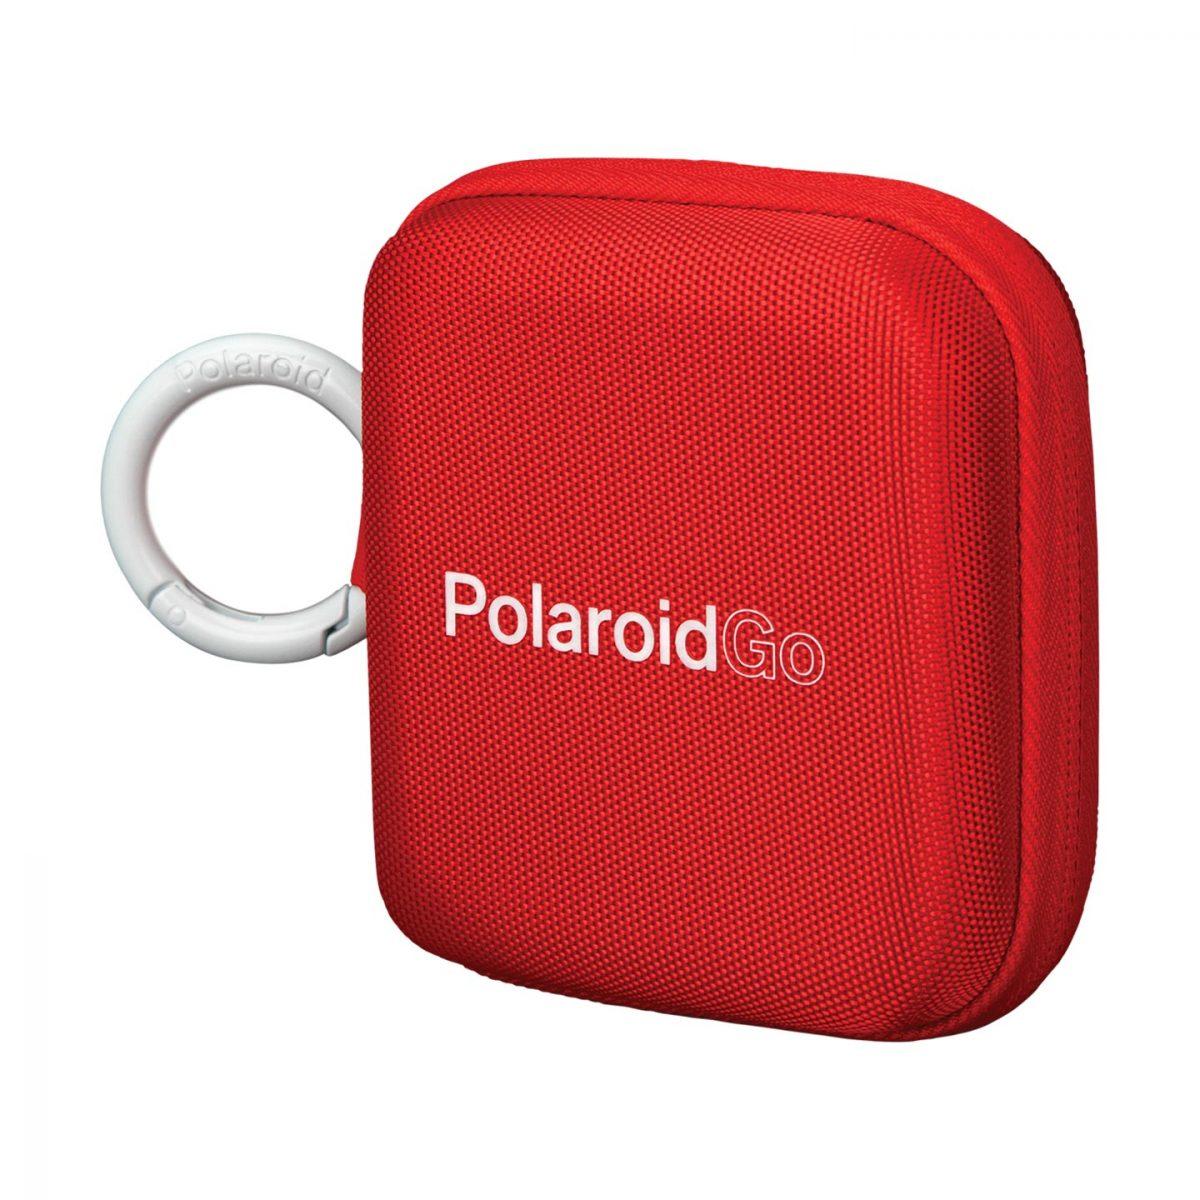 polaroid_go_photo_album_rd_01